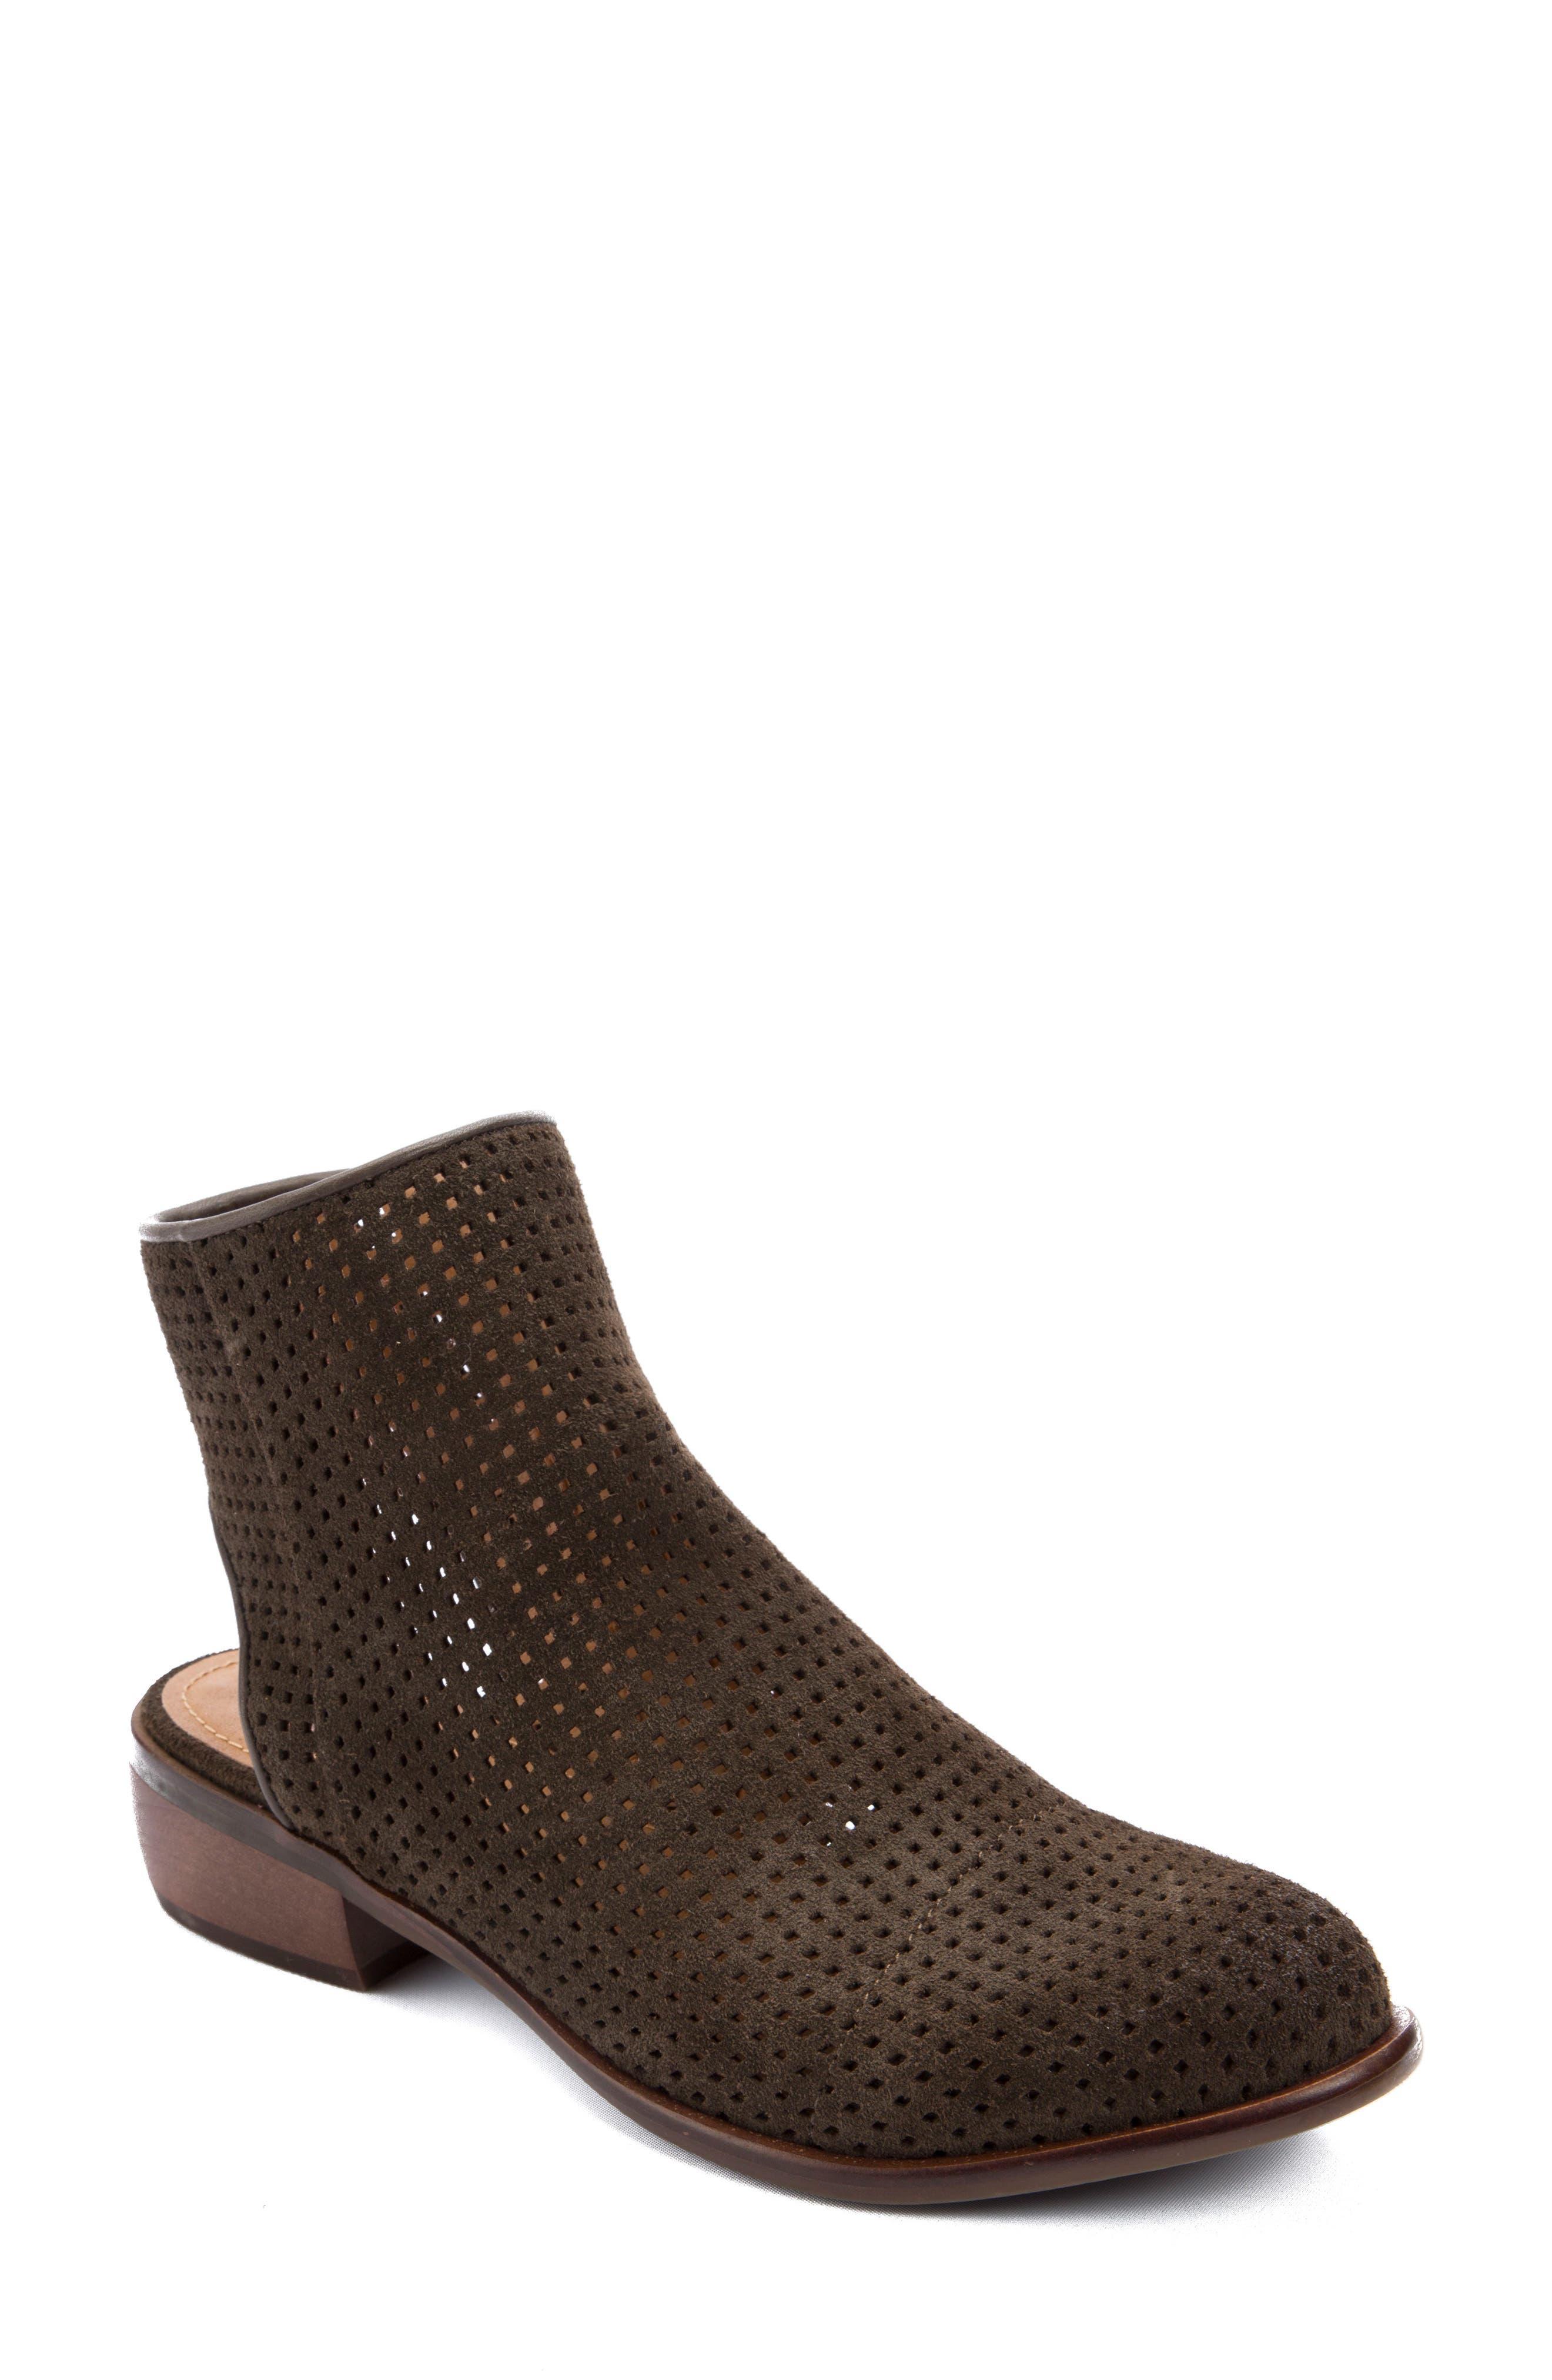 Main Image - Latigo Izadore Perforated Open Heel Bootie (Women)